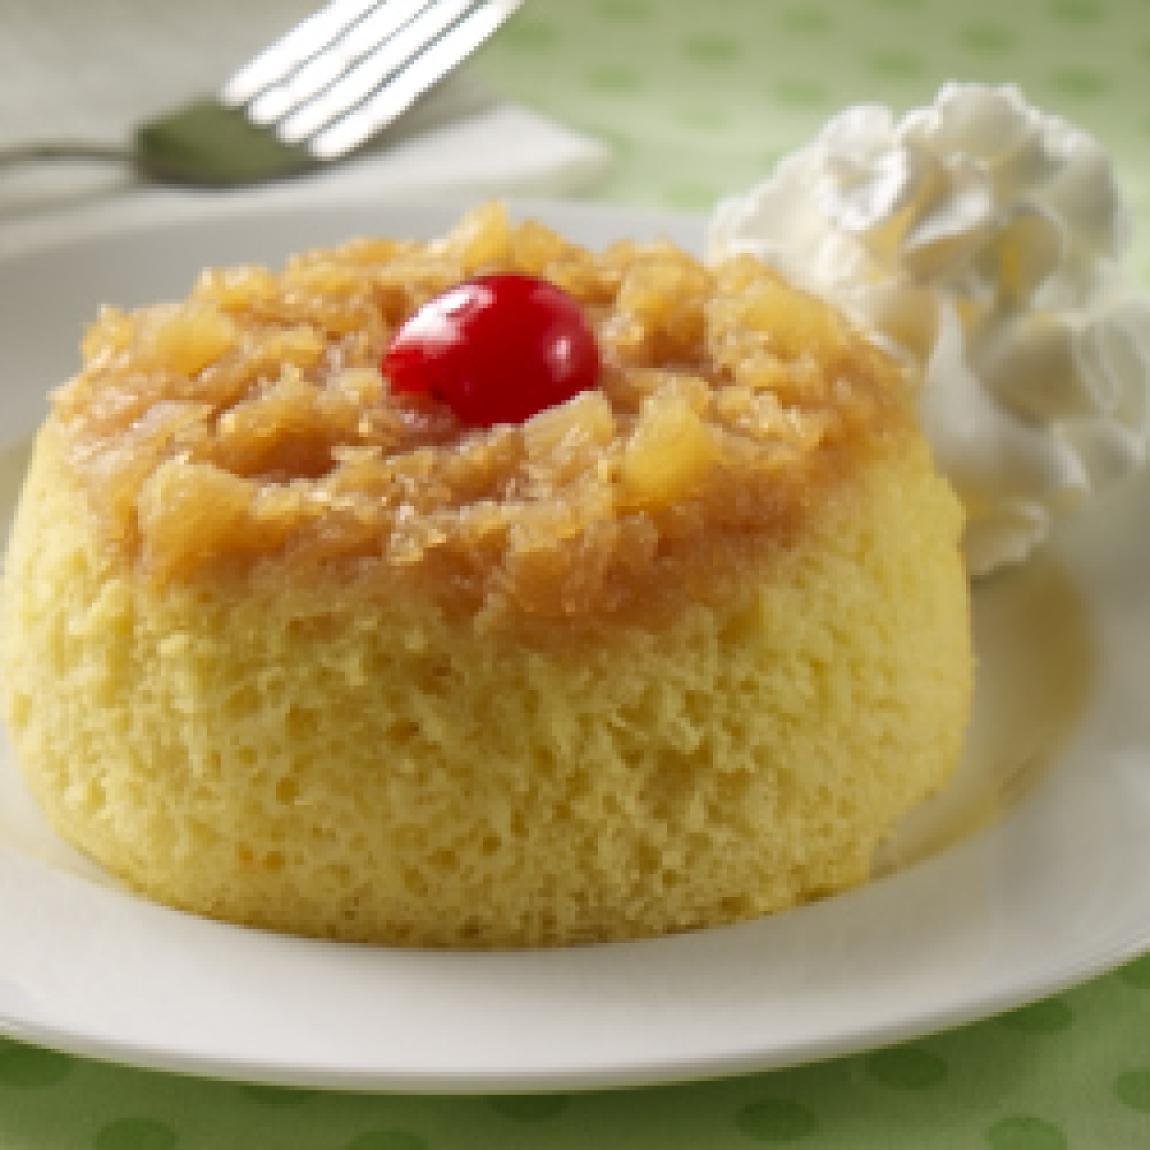 Crushed Pineapple Upside Down Cake  Pineapple Upside Down Mug Cakes Recipe